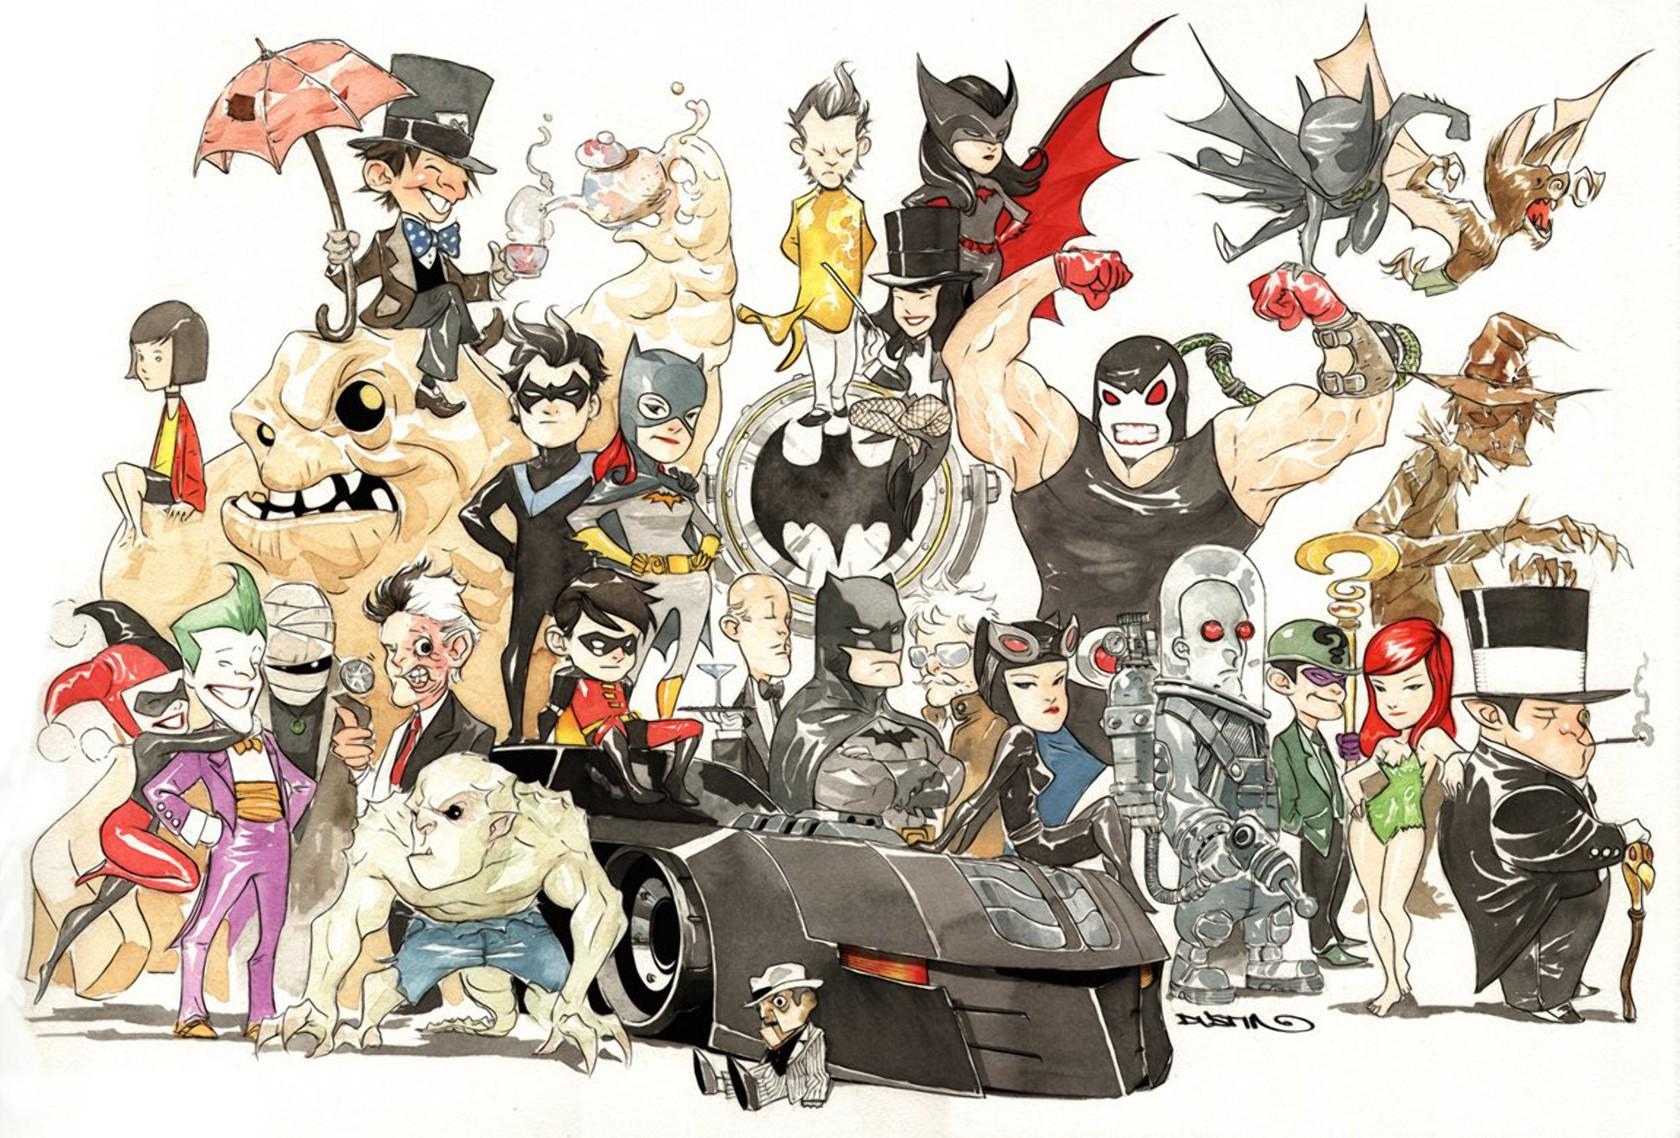 General 1680x1138 Batman Robin (superhero) Catwoman Harley Quinn Joker Batgirl Zatanna Bane Batwoman Scarecrow (character) Alfred Pennyworth Two-Face